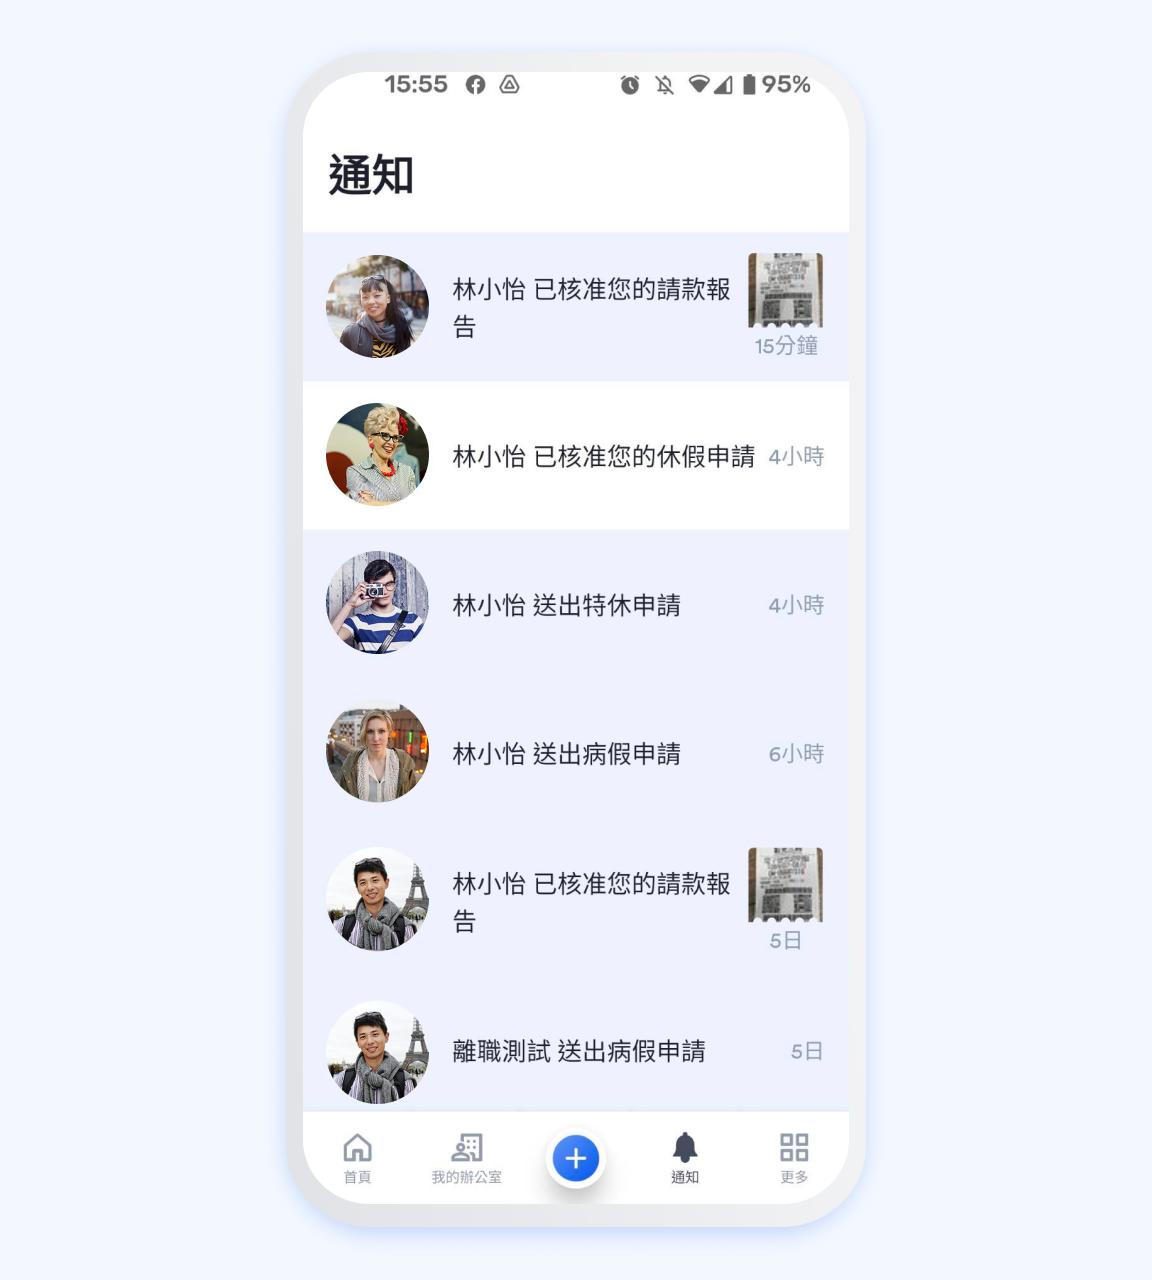 Swingvy雲端人資系統的手機App能讓你即時收到請假訊息。